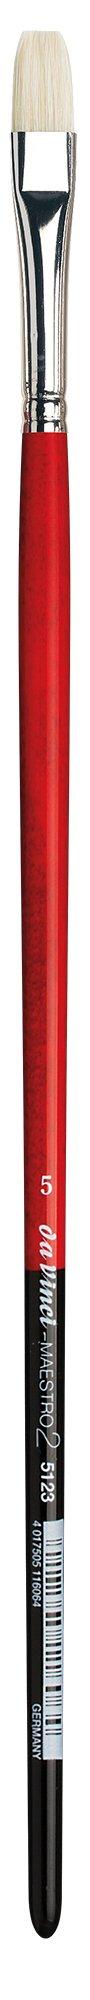 da Vinci Hog Bristle Series 5123 Maestro 2 Artist Paint Brush, Bright Medium-Length with Red Handle, Size 5 (5123-05)